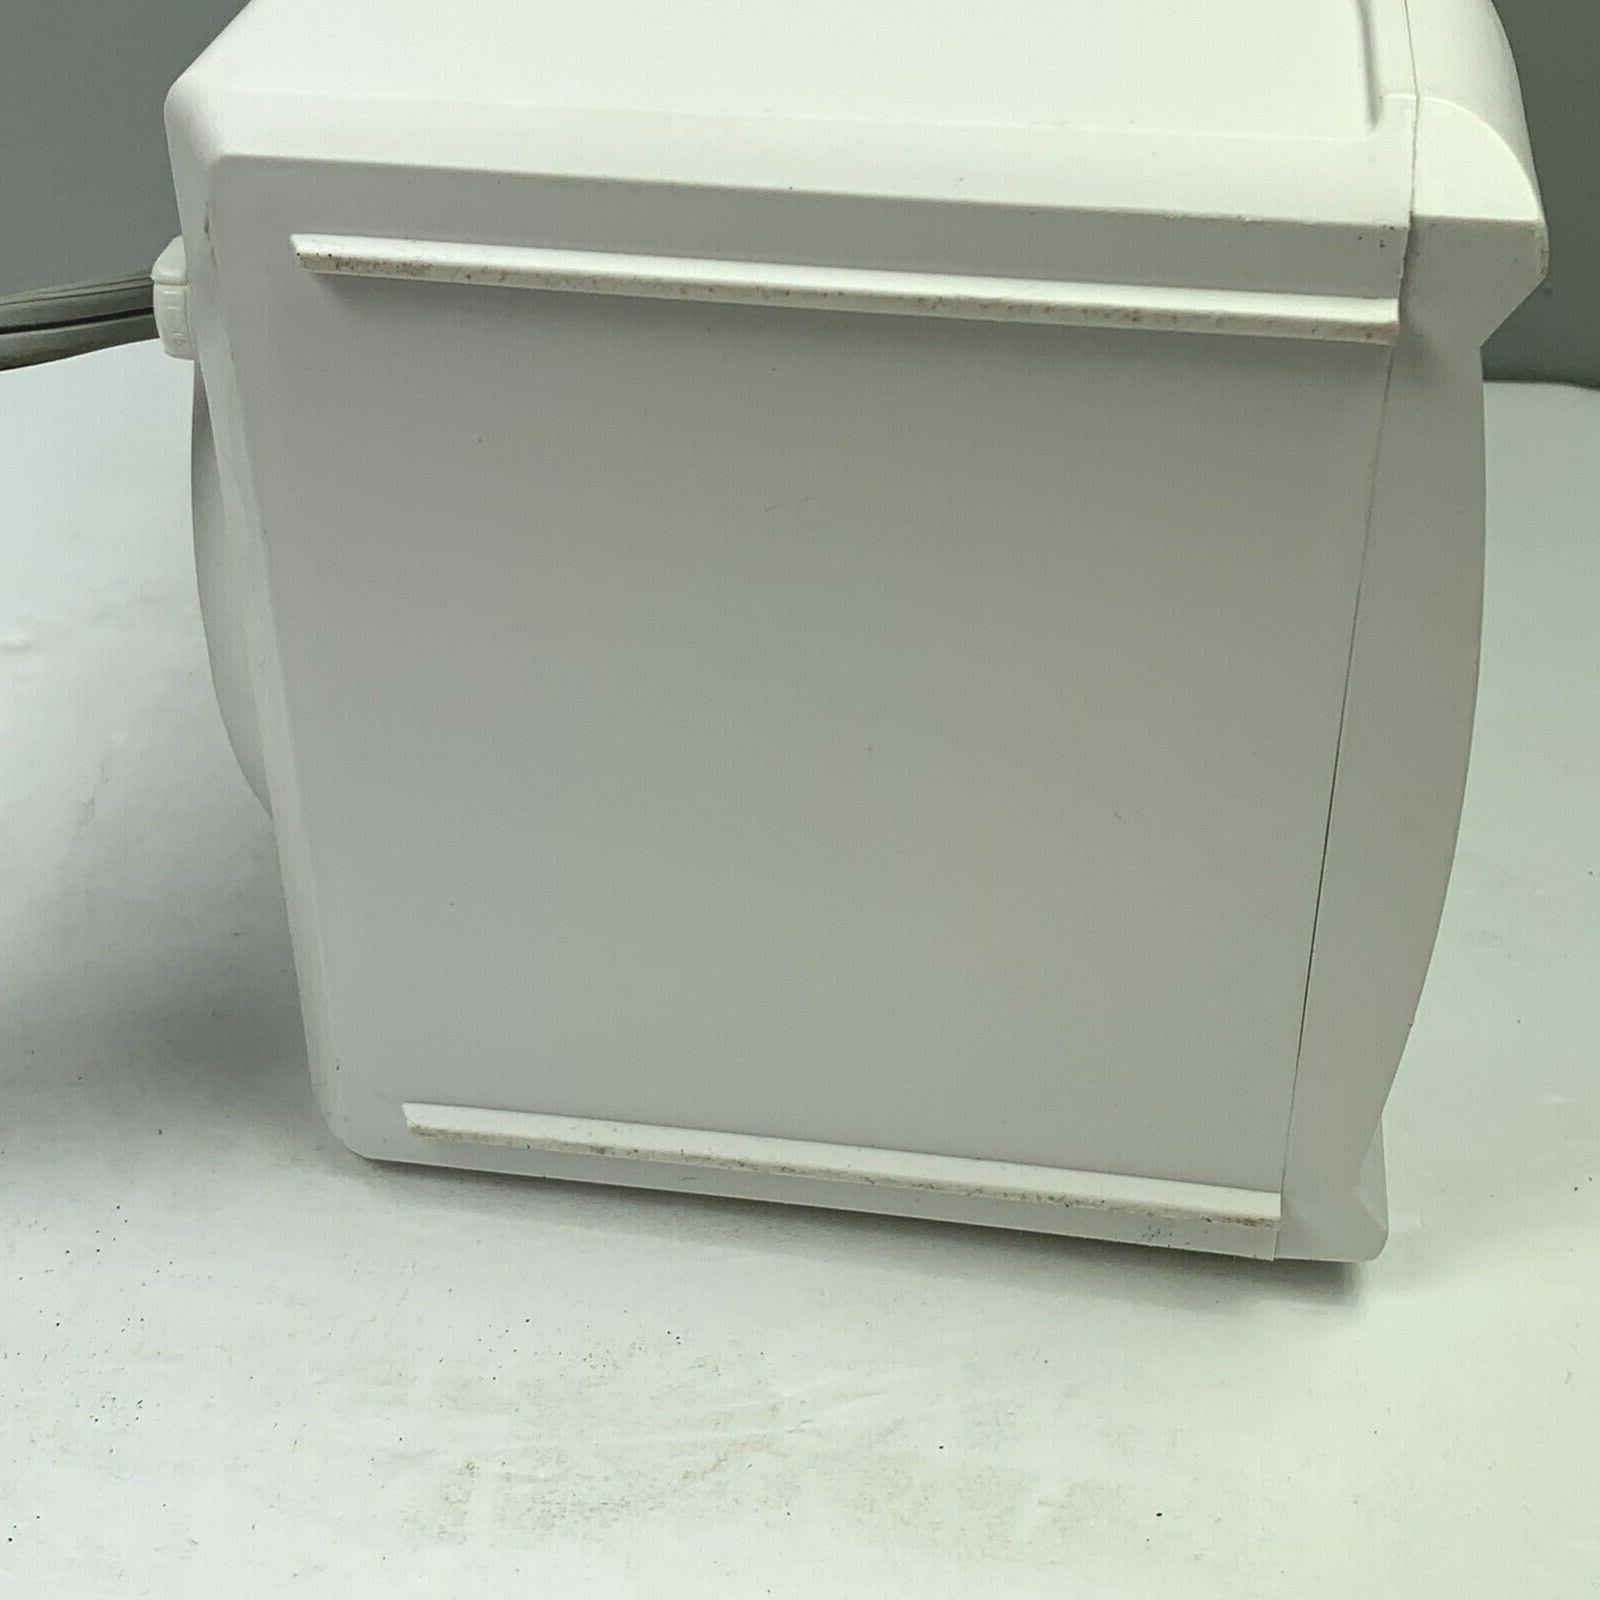 Holmes Personal Heater HCH159-UM Office Clean